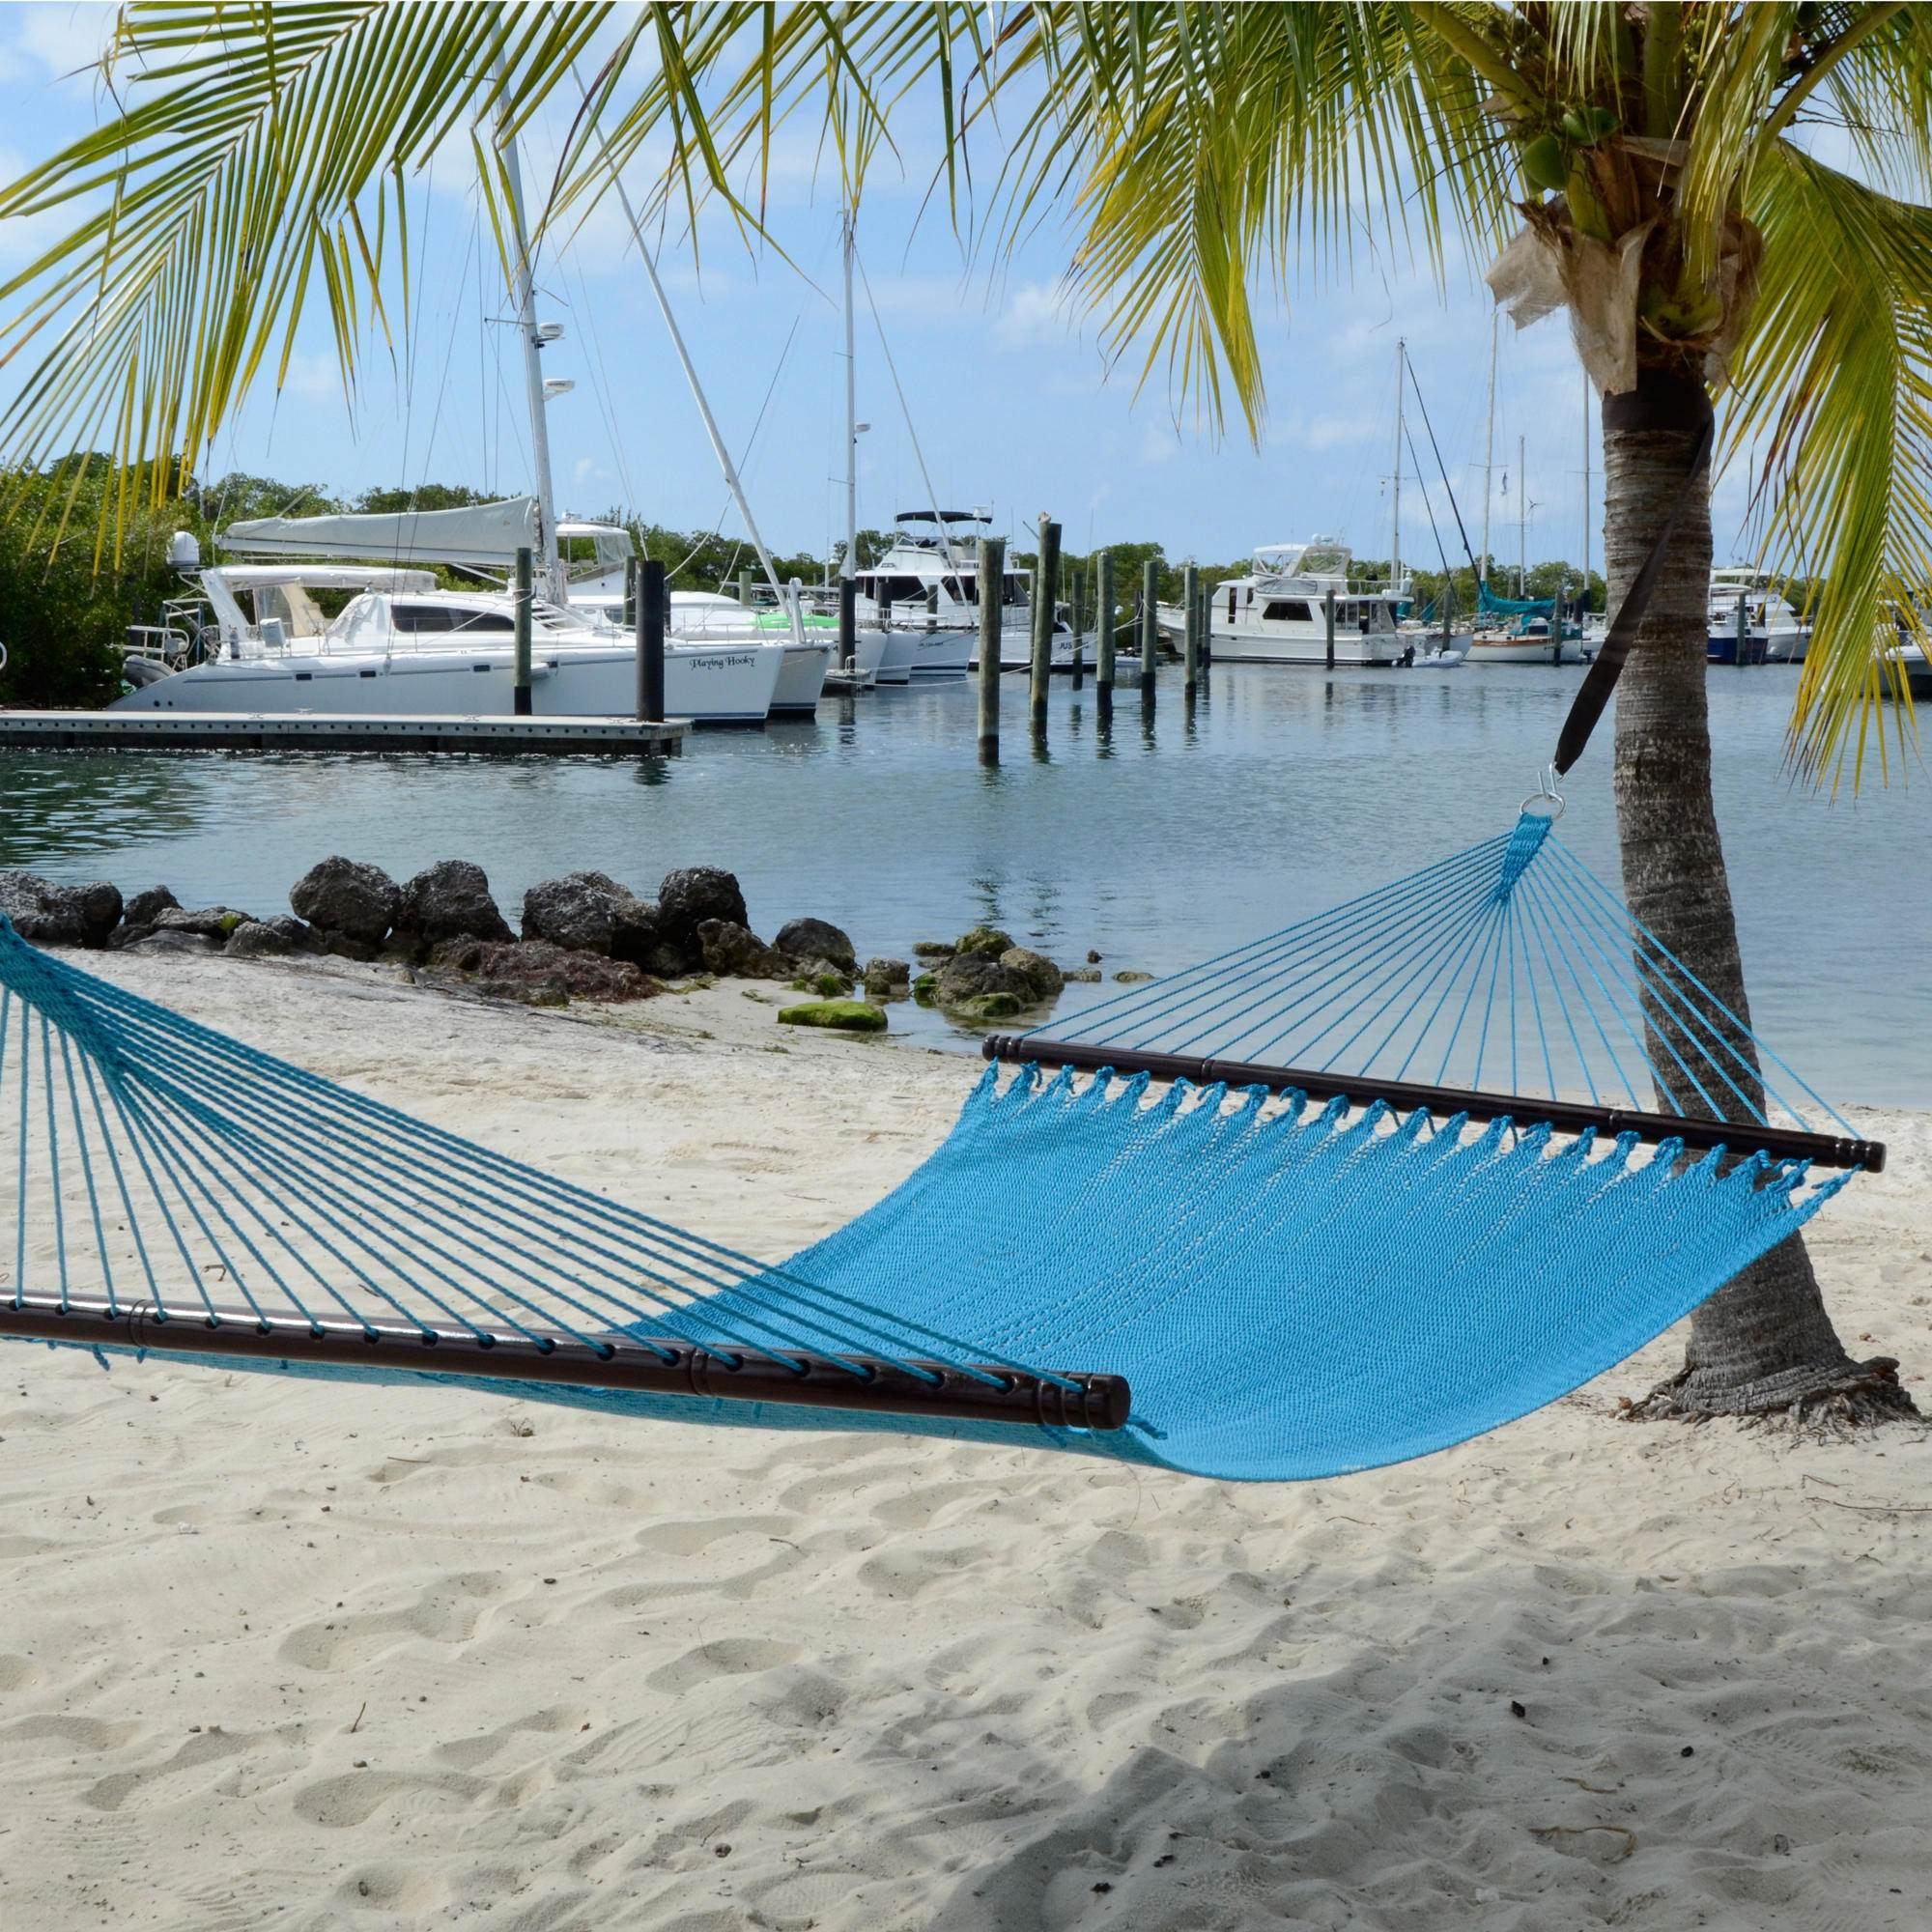 pawleys shops the hanger hammock haute island